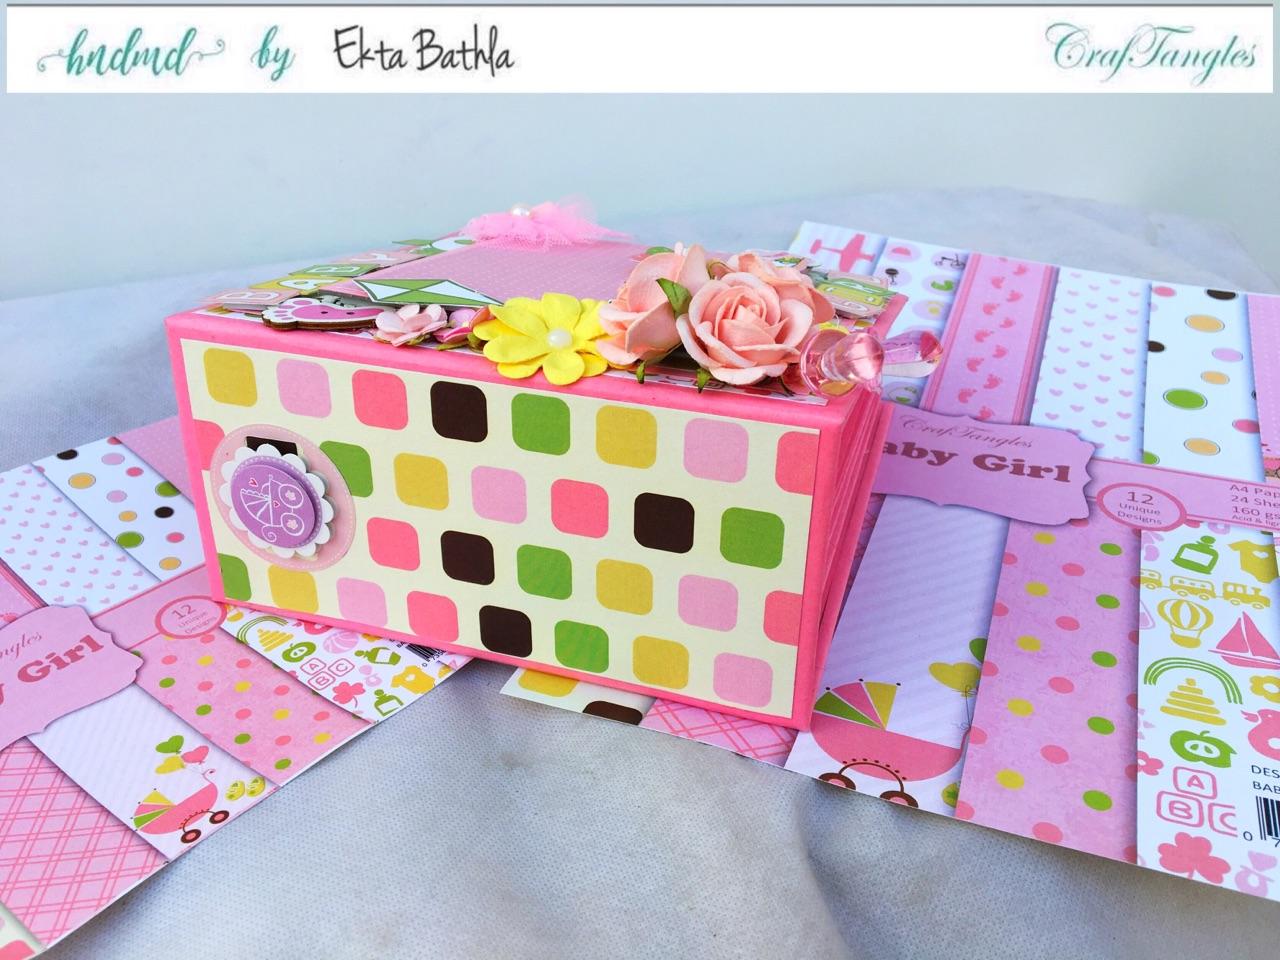 Baby Girl mini album showcasing Baby Girl Elements Pack by CrafTangles 13